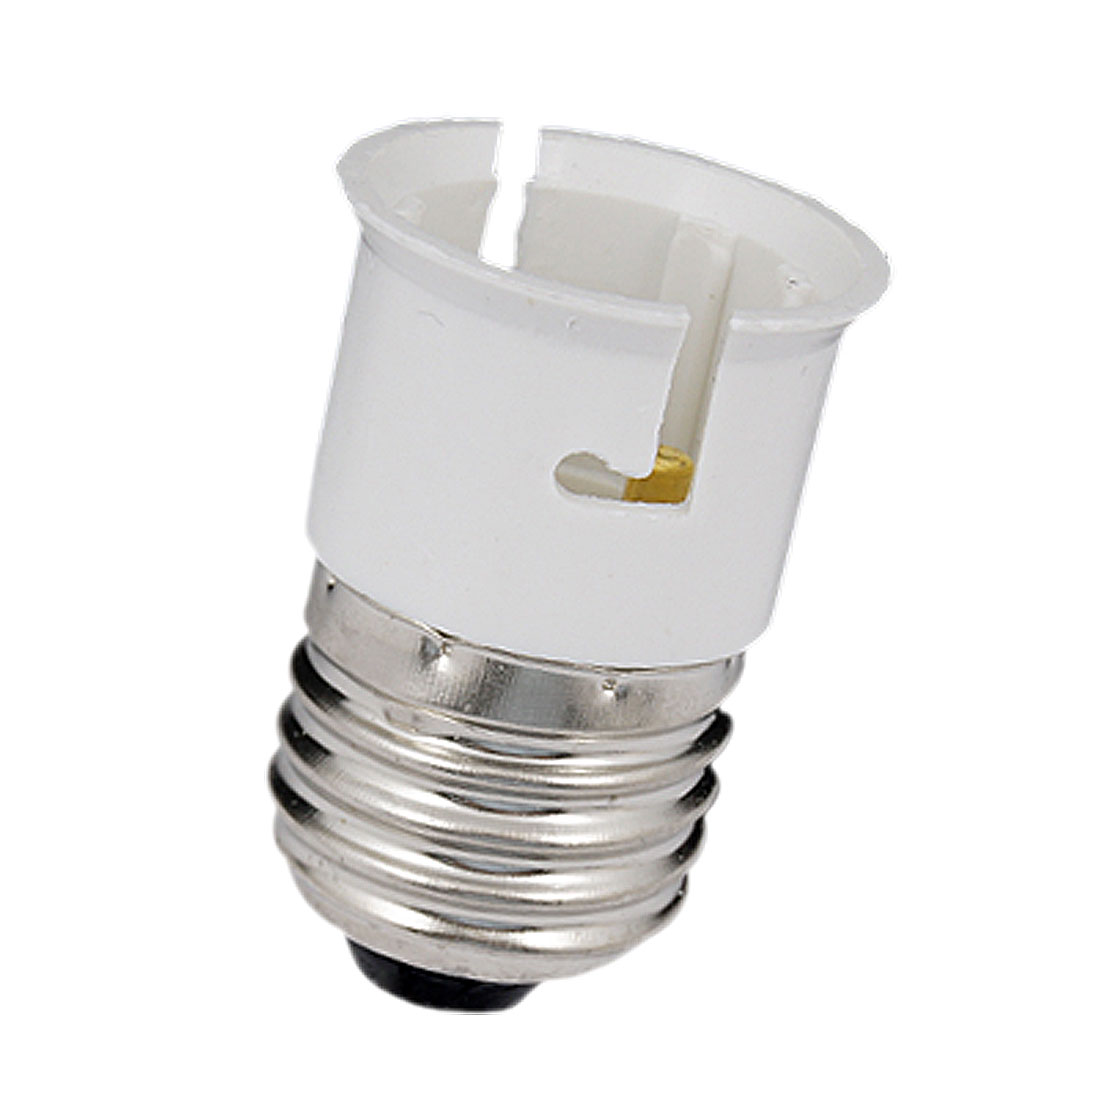 B22 to E27 Light Lamp Bulb Holder Socket Adapter Convertor